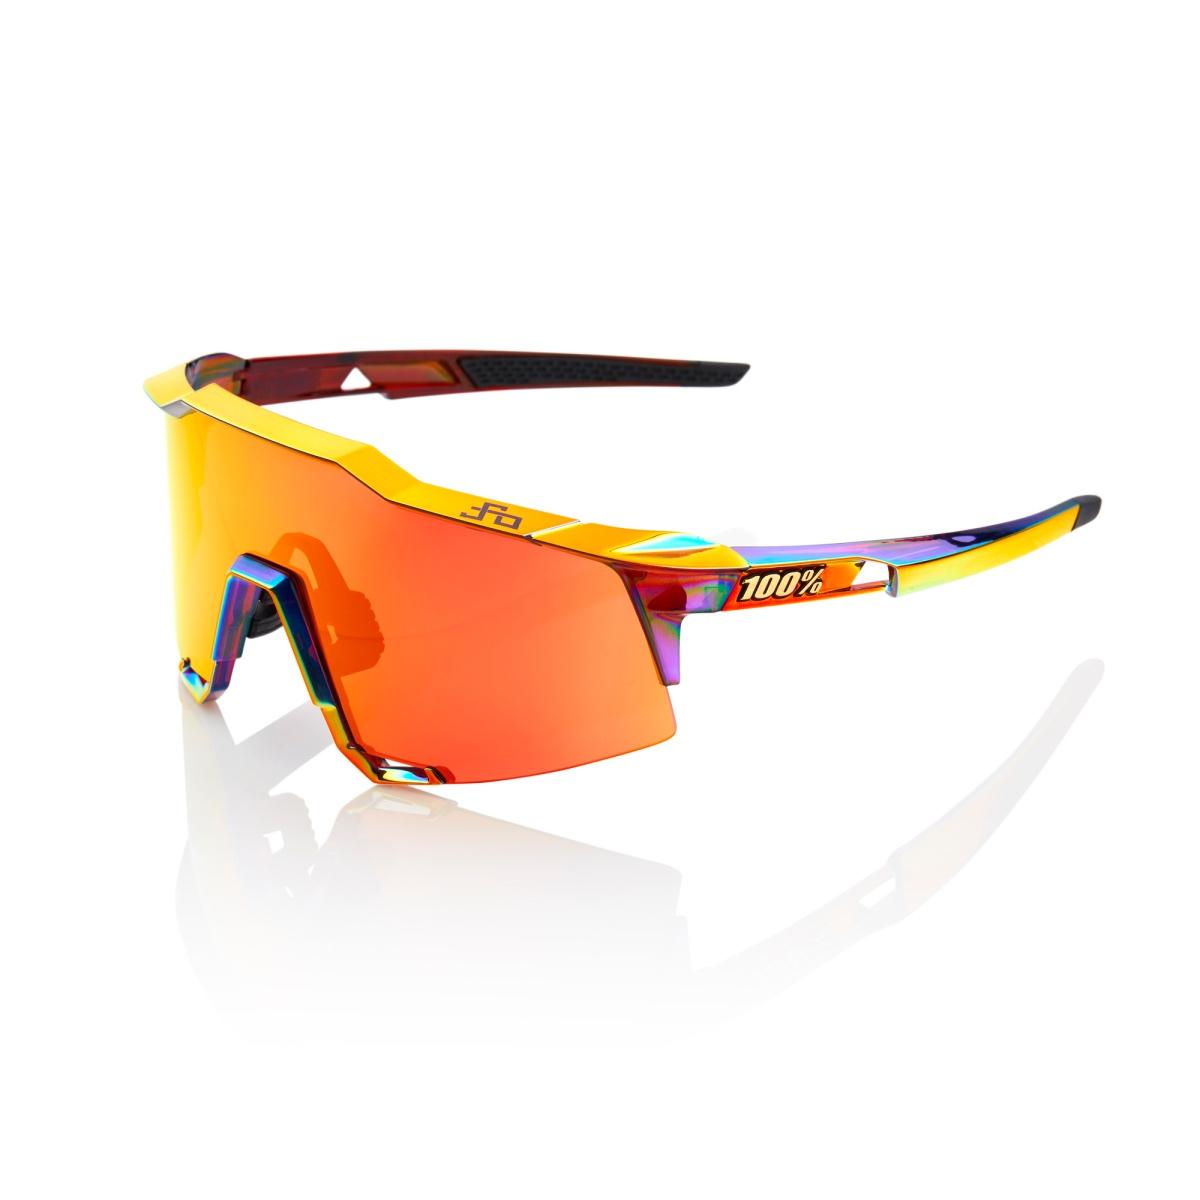 100% Limited Edition Peter Sagan Speedcraft sunglasses.